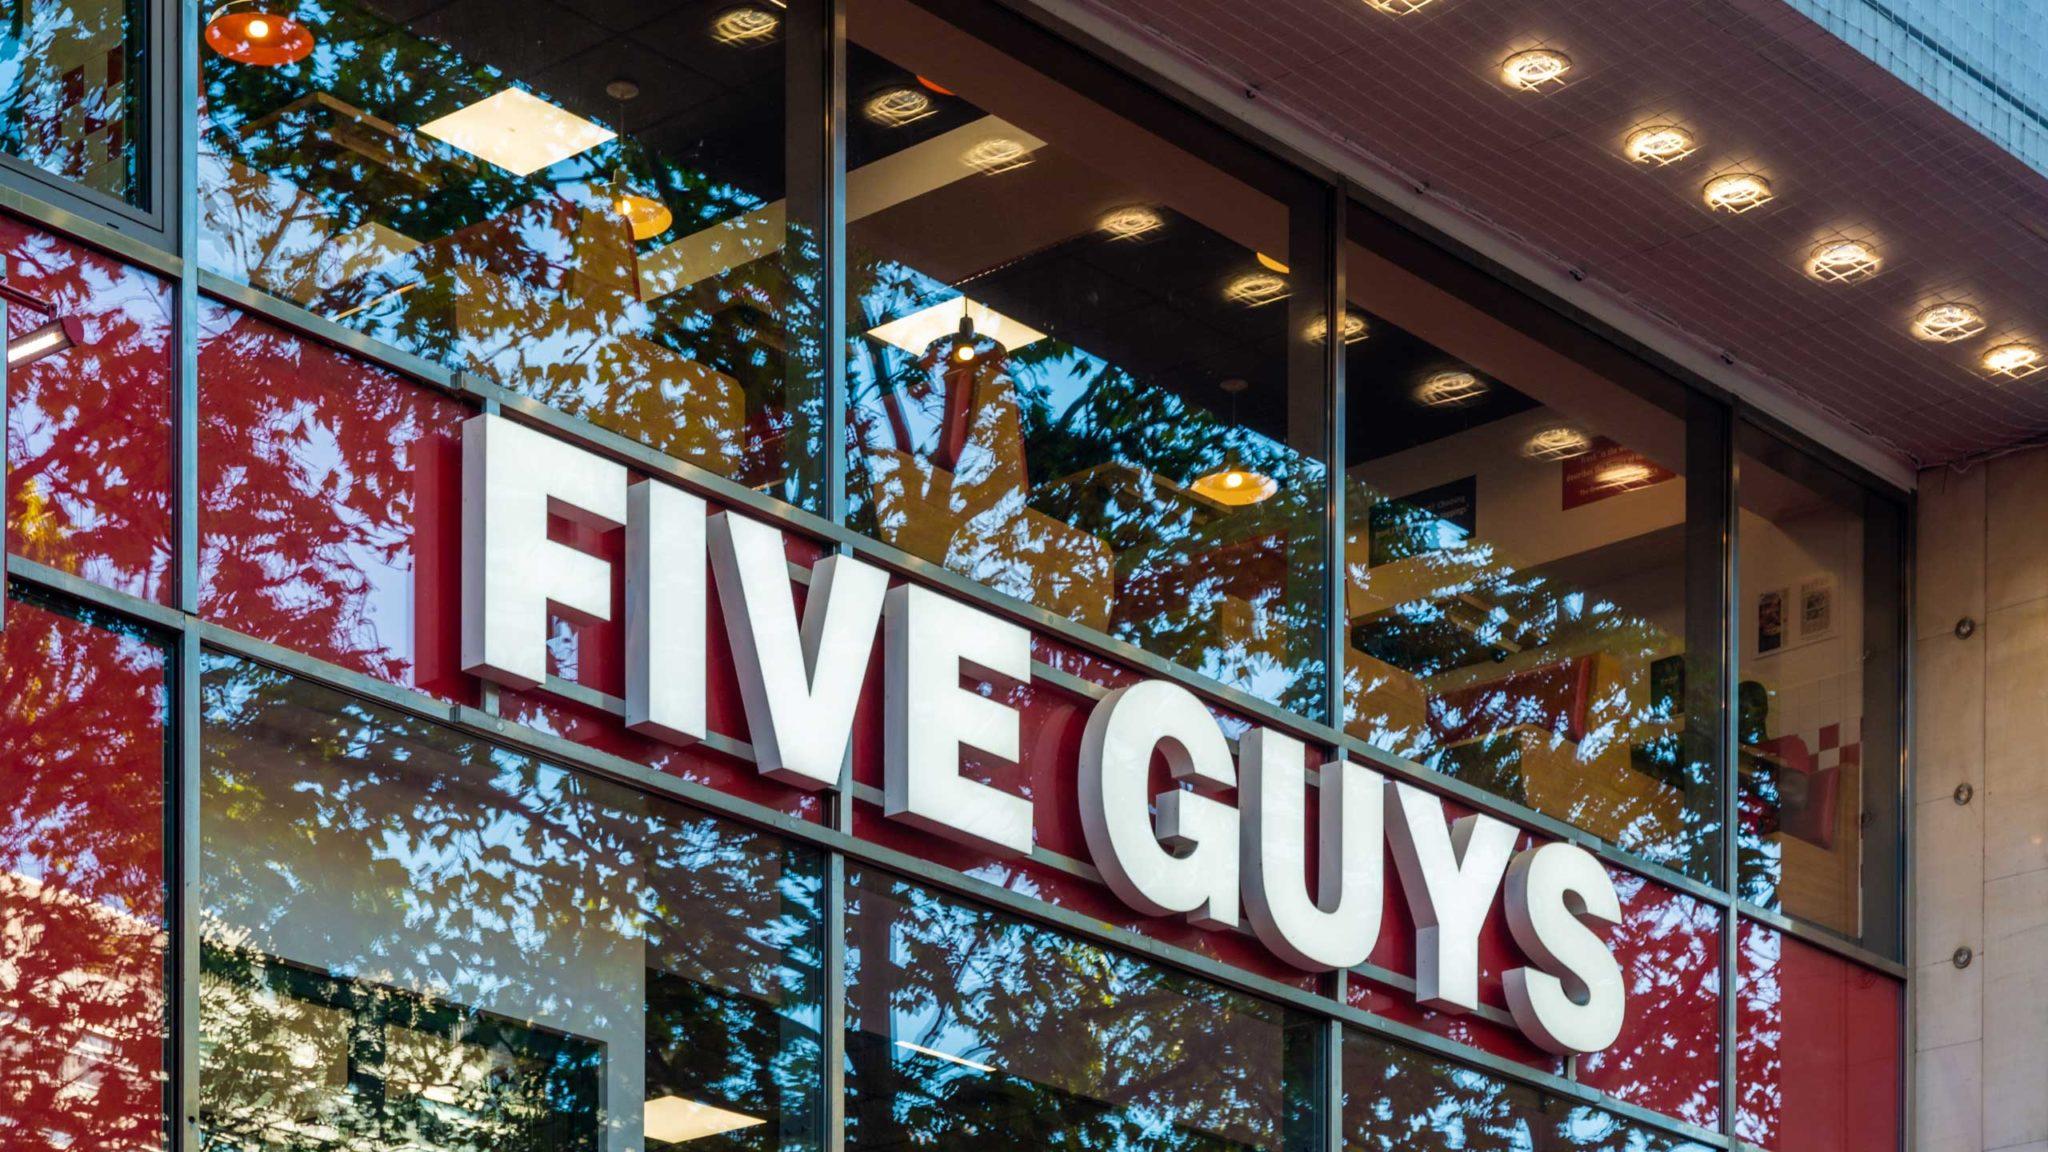 Five Guys signage on restaurant window